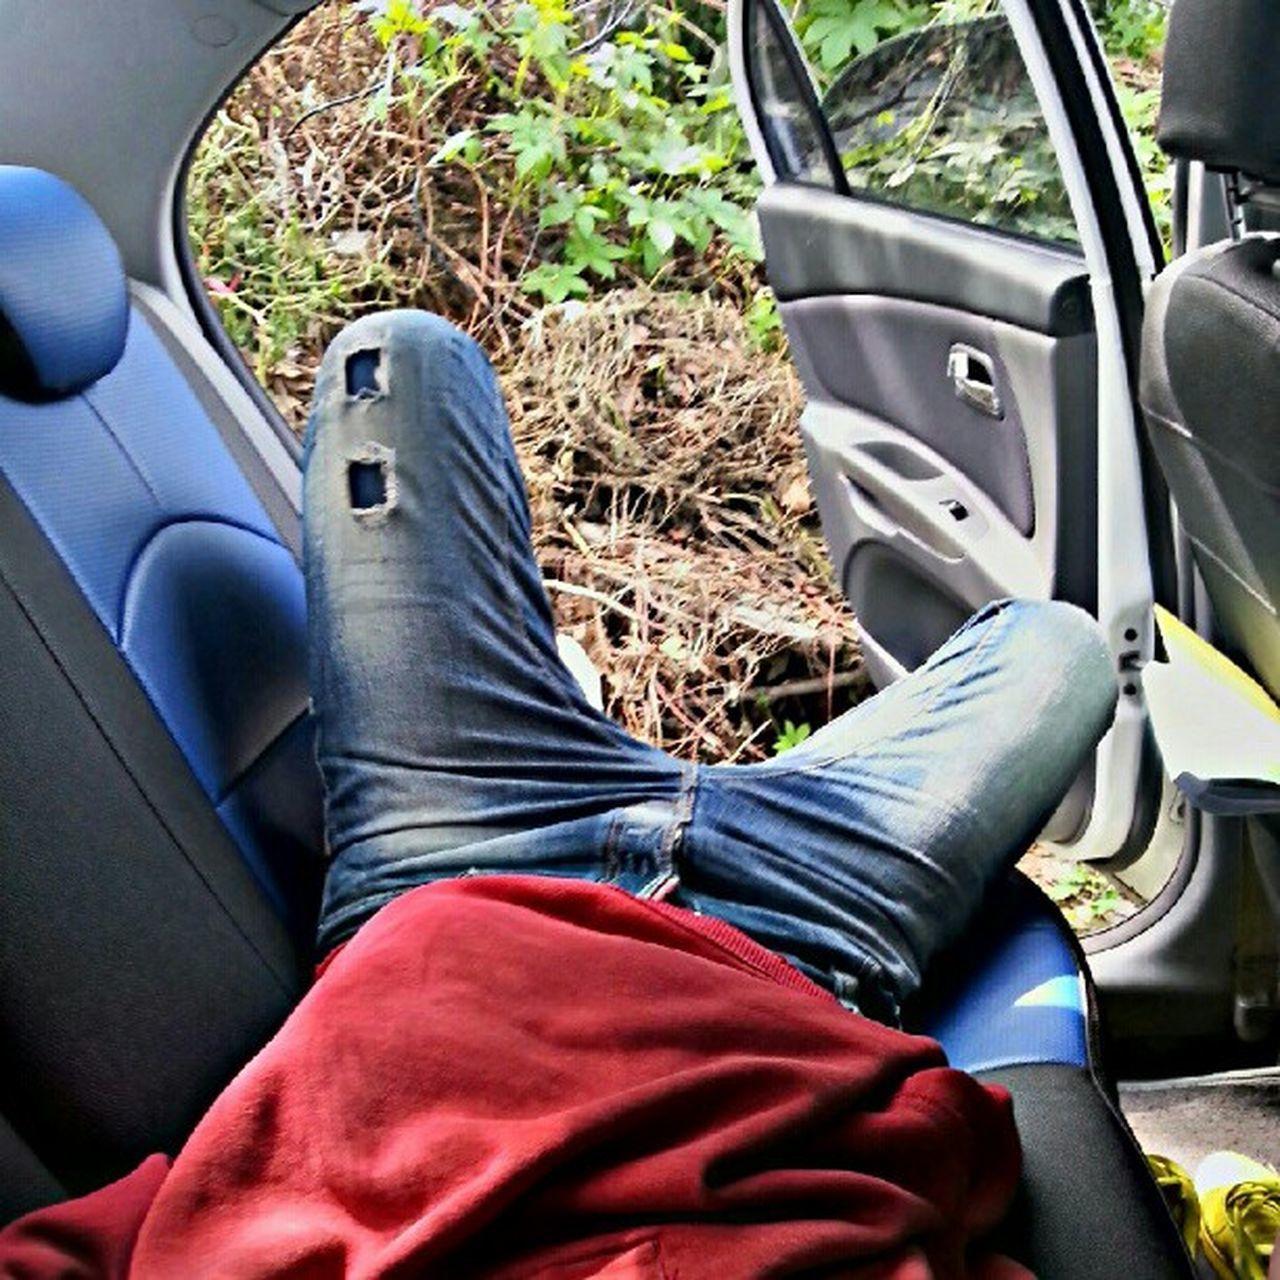 Take a nap! Nap Car Jeans DSQUARED2 red hoodie back seat laid korea Seoul